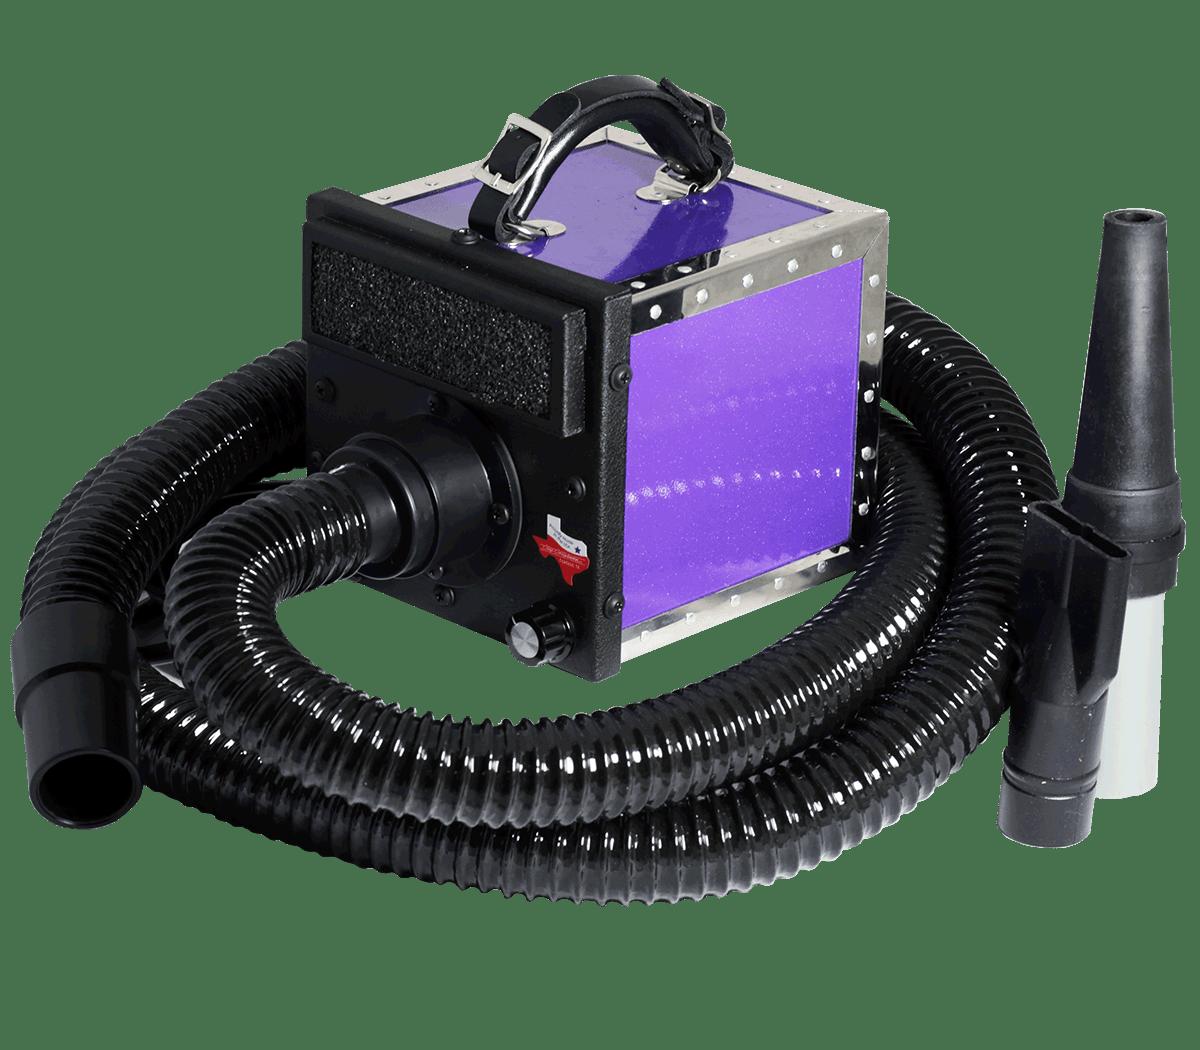 https://dogkart.in/ImageUploads/Xtreme---Purple-min.png